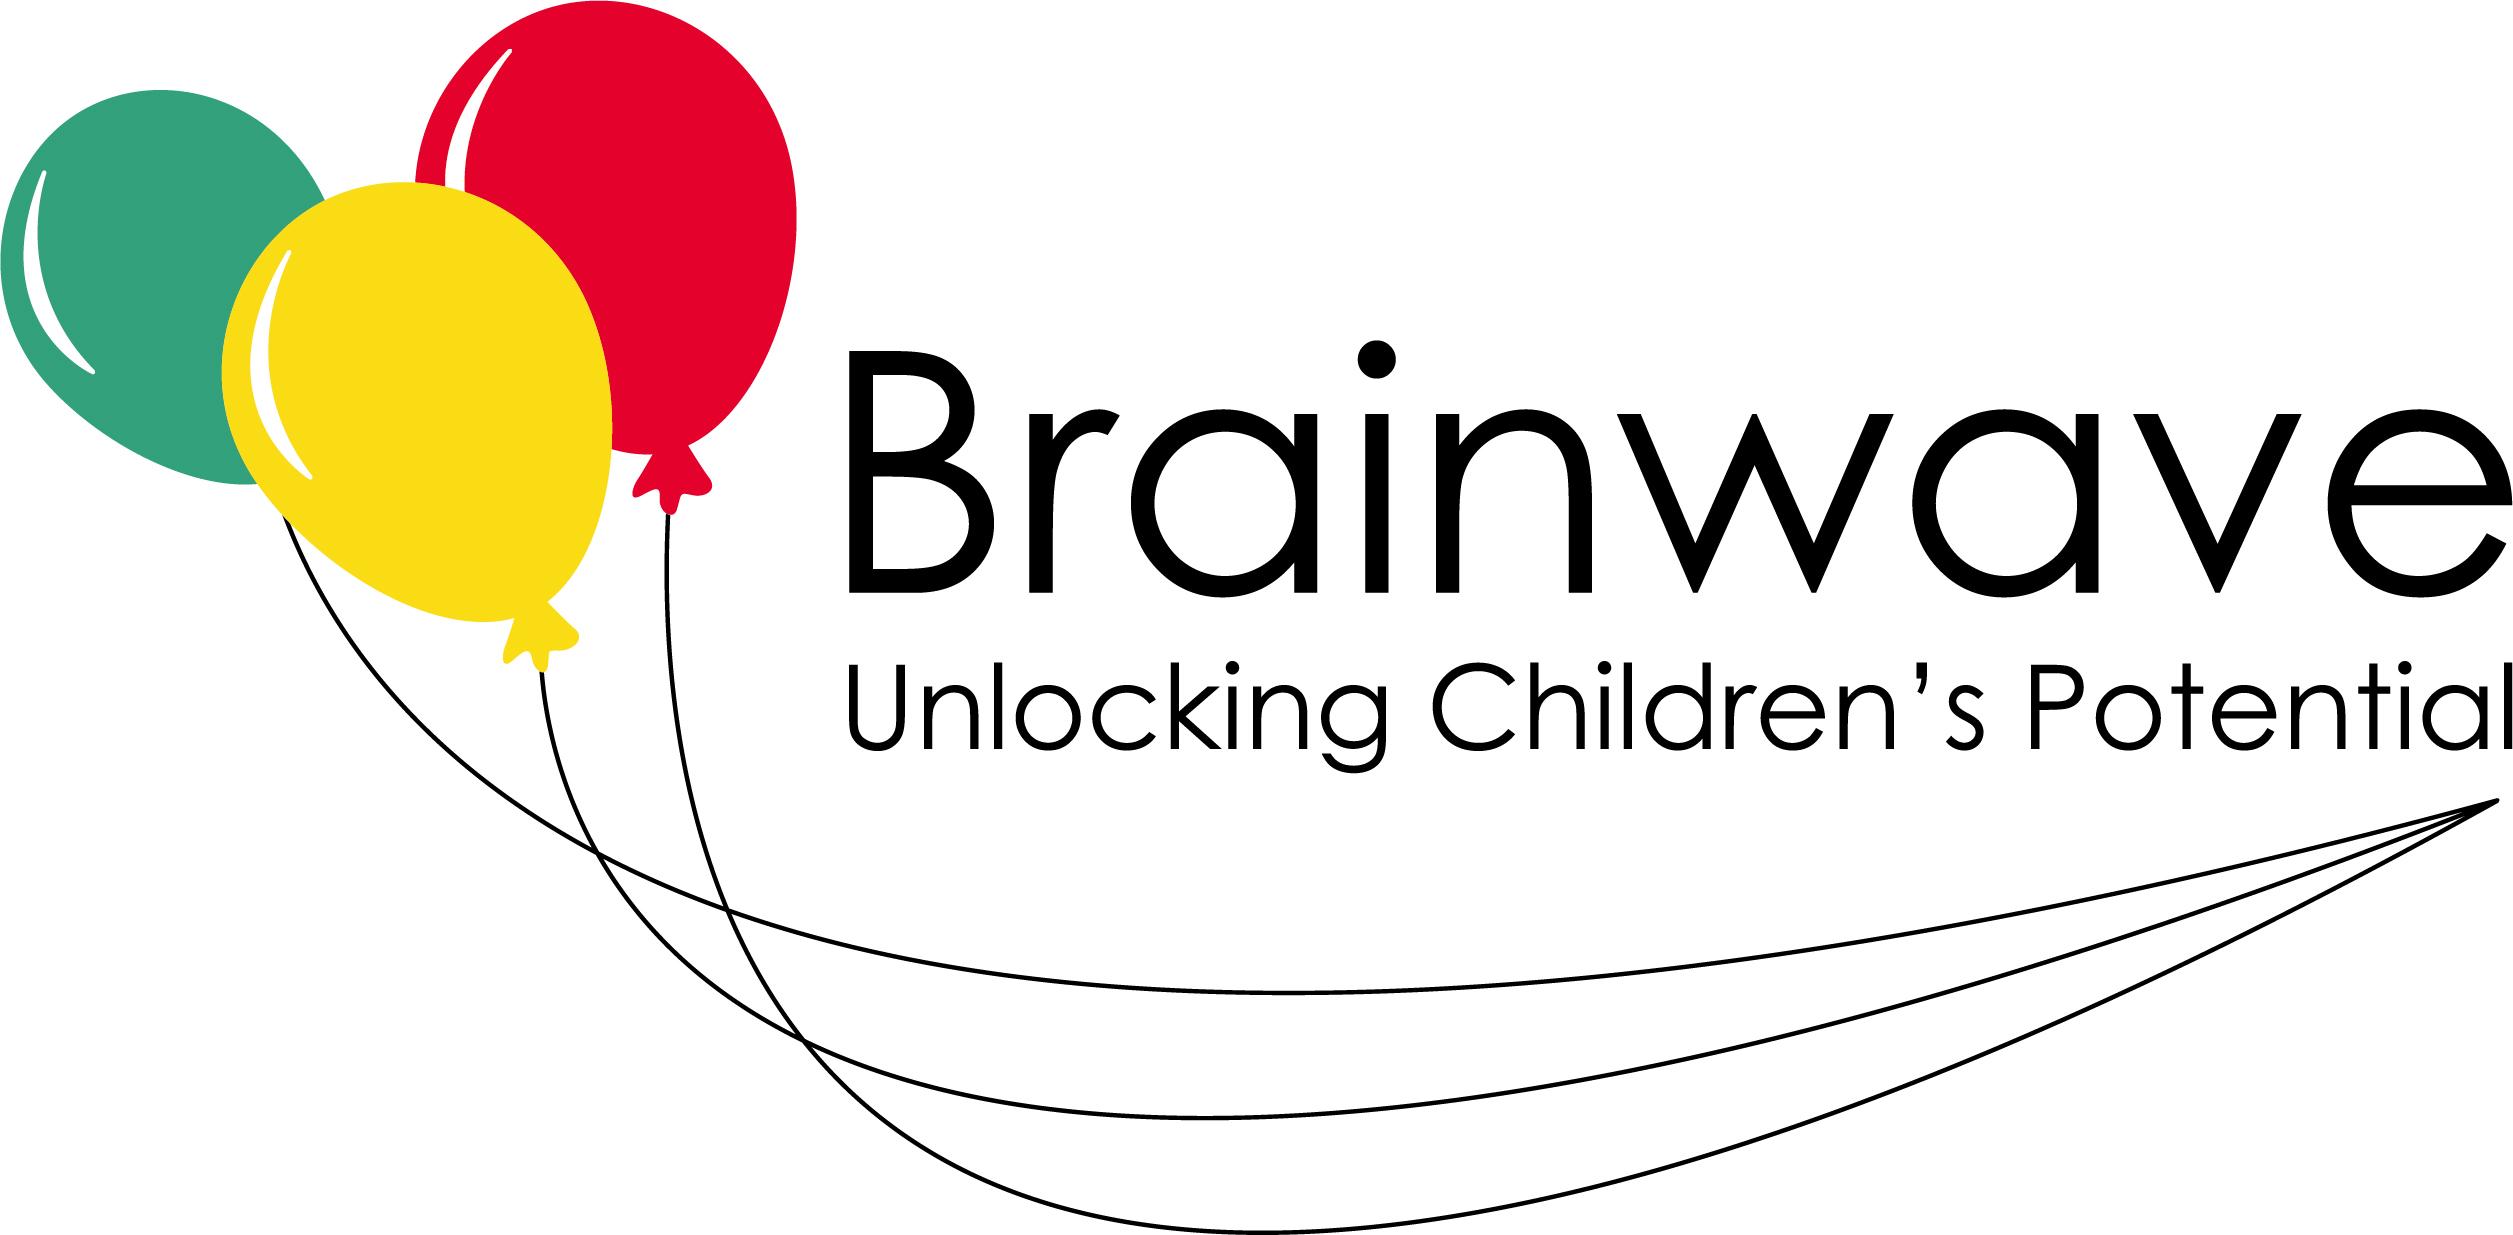 The Brainwave Centre